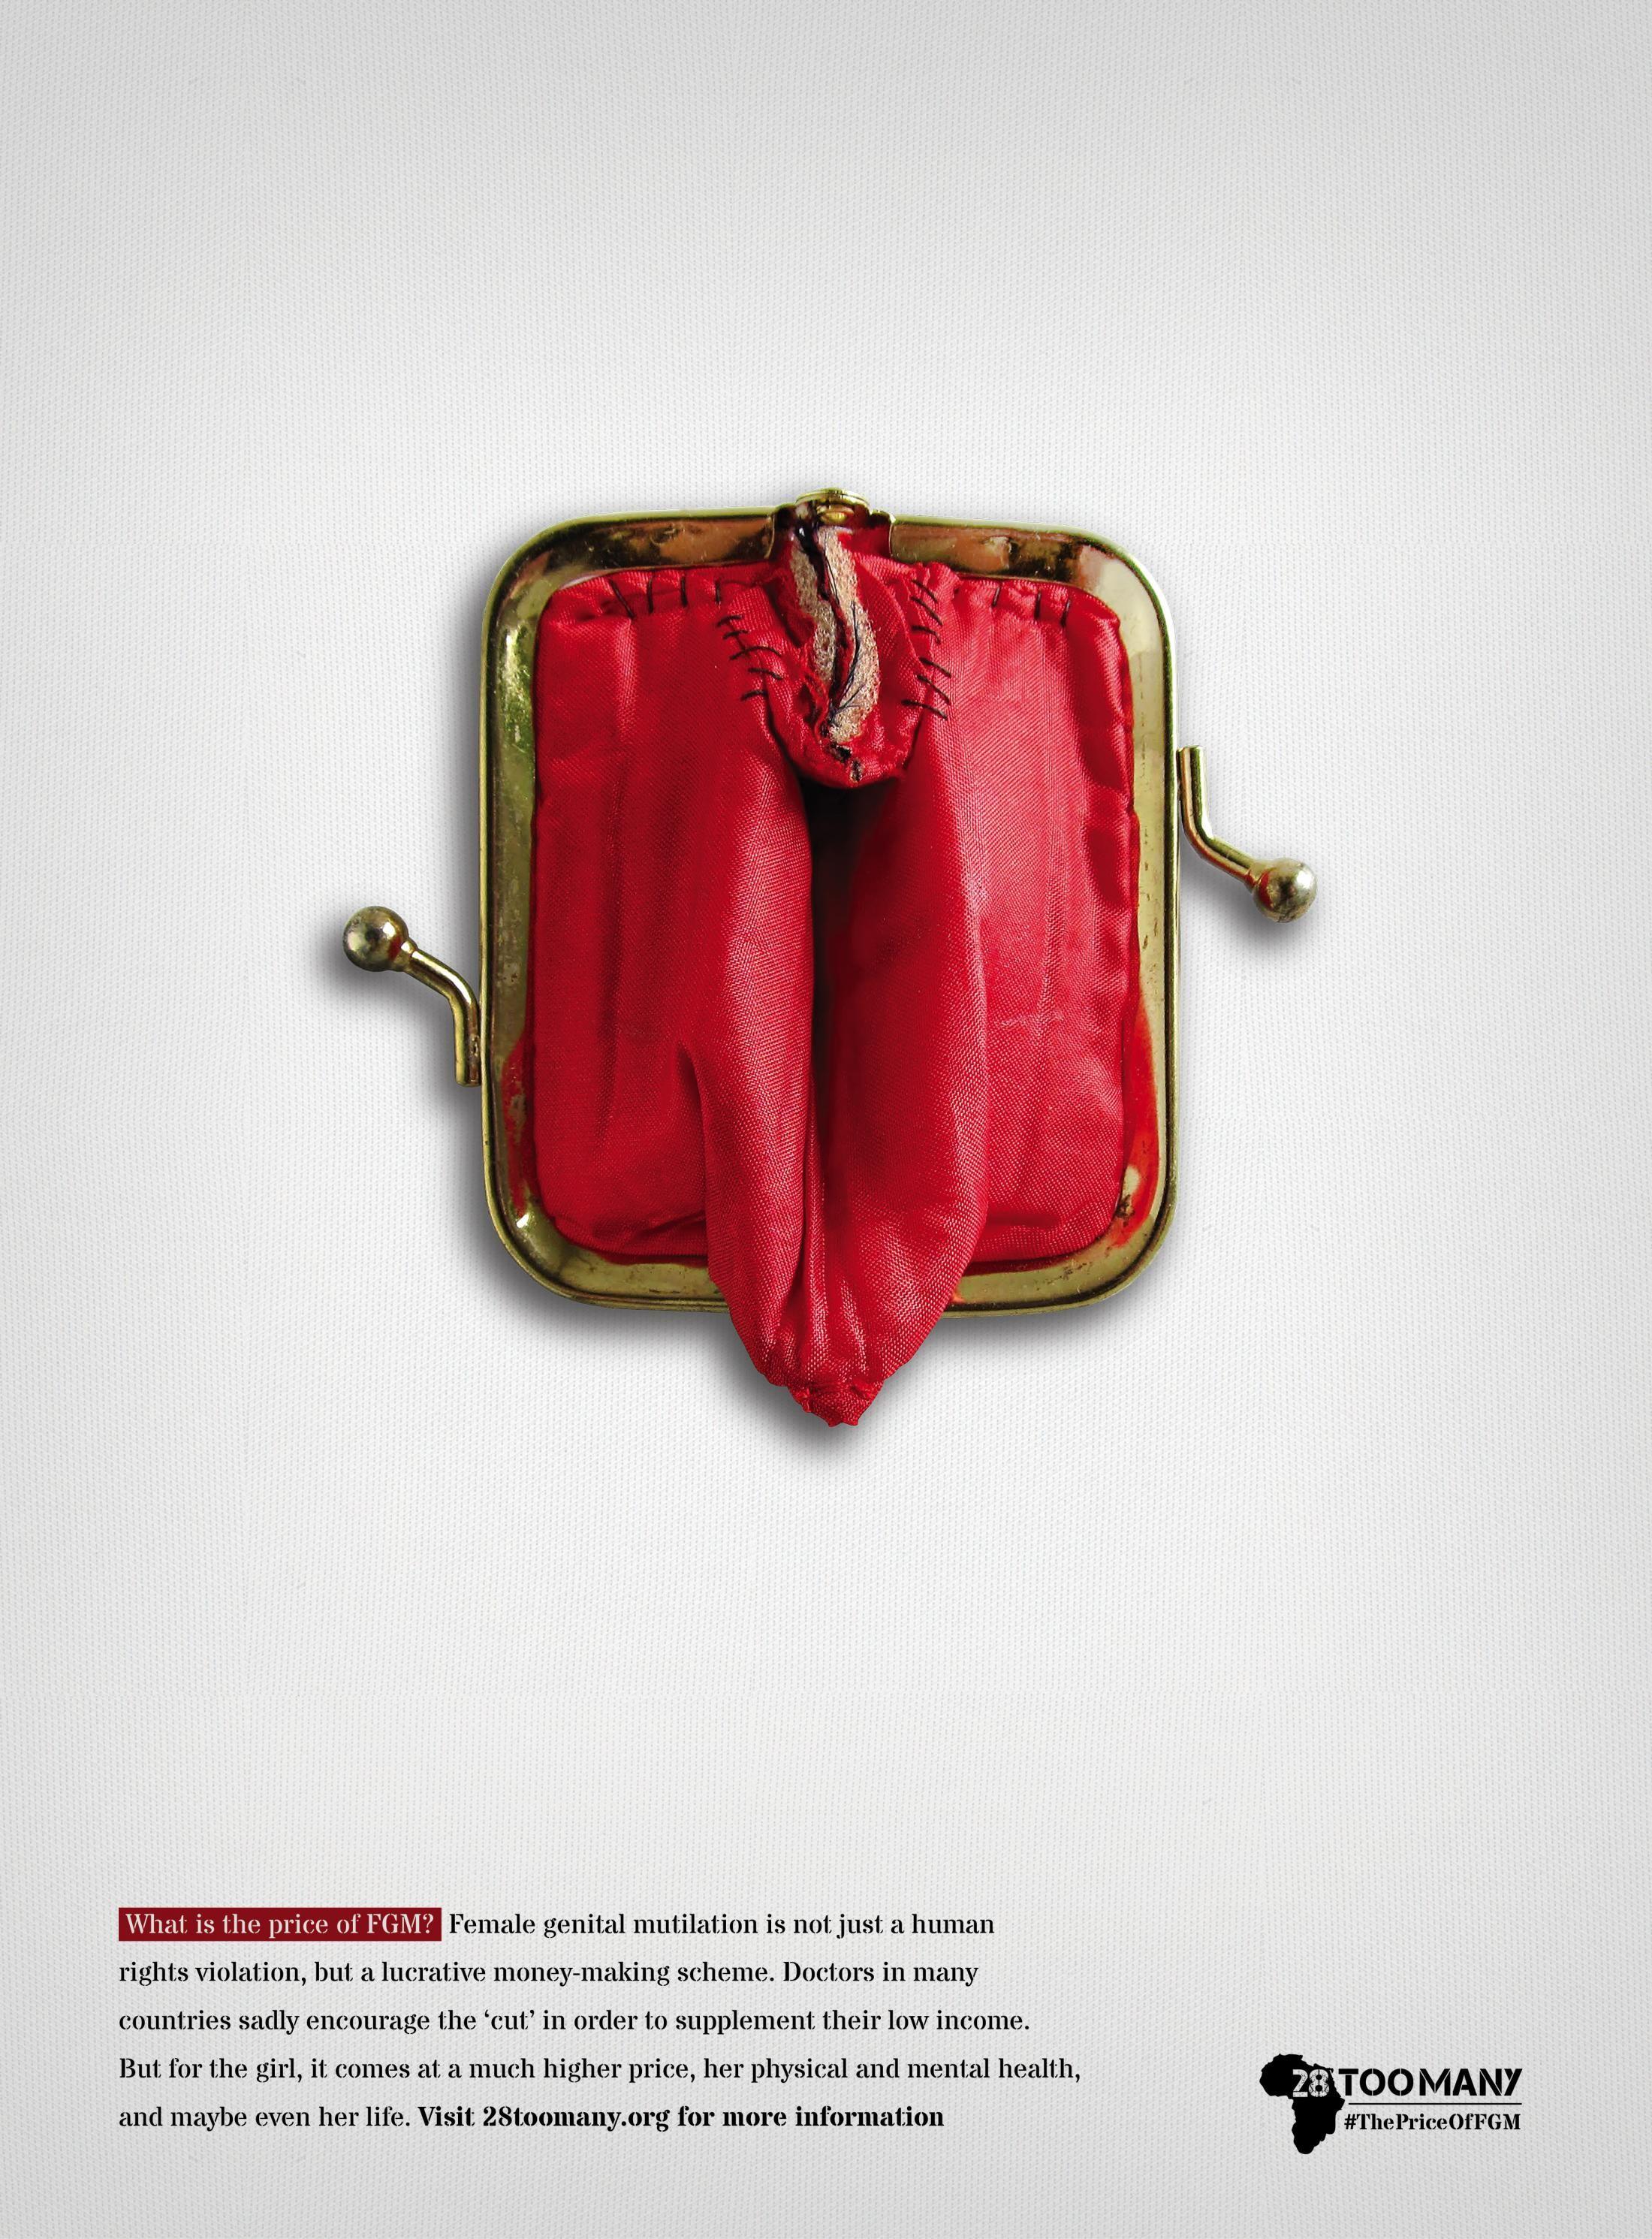 pin by mohammad bahja on awareness ideas visuals pinterest